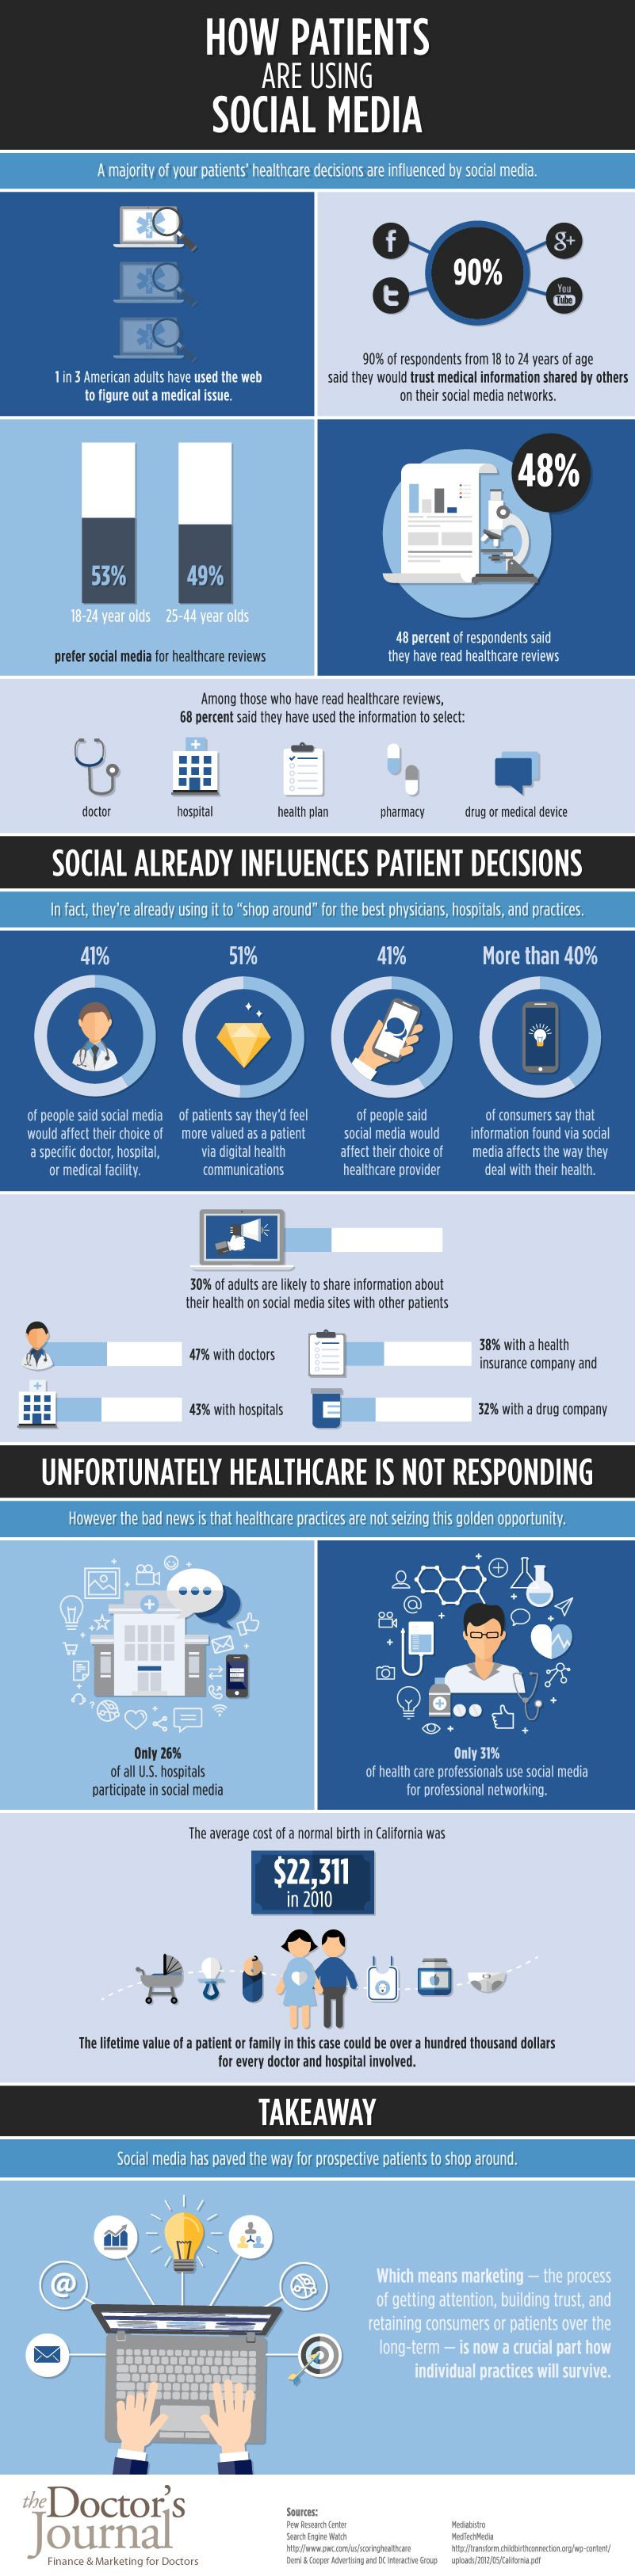 Image via disabilityinsuranceagency.com